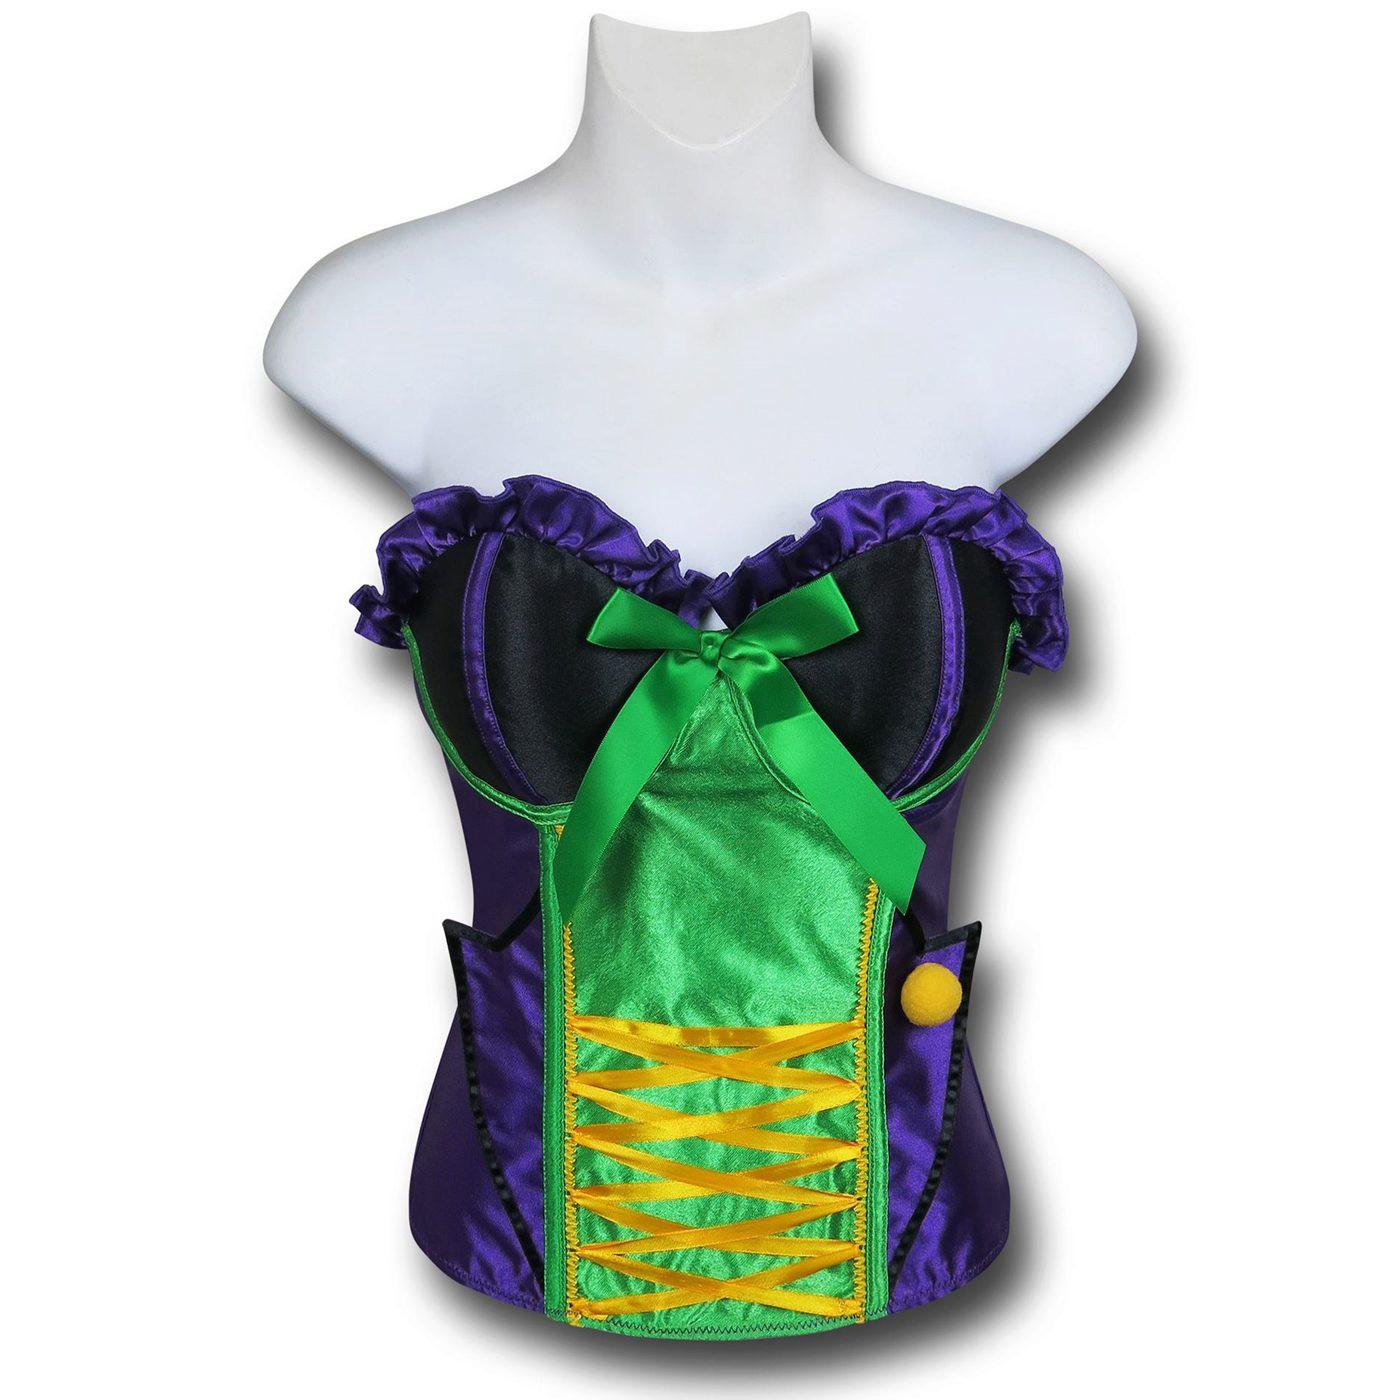 Joker Costume Corset